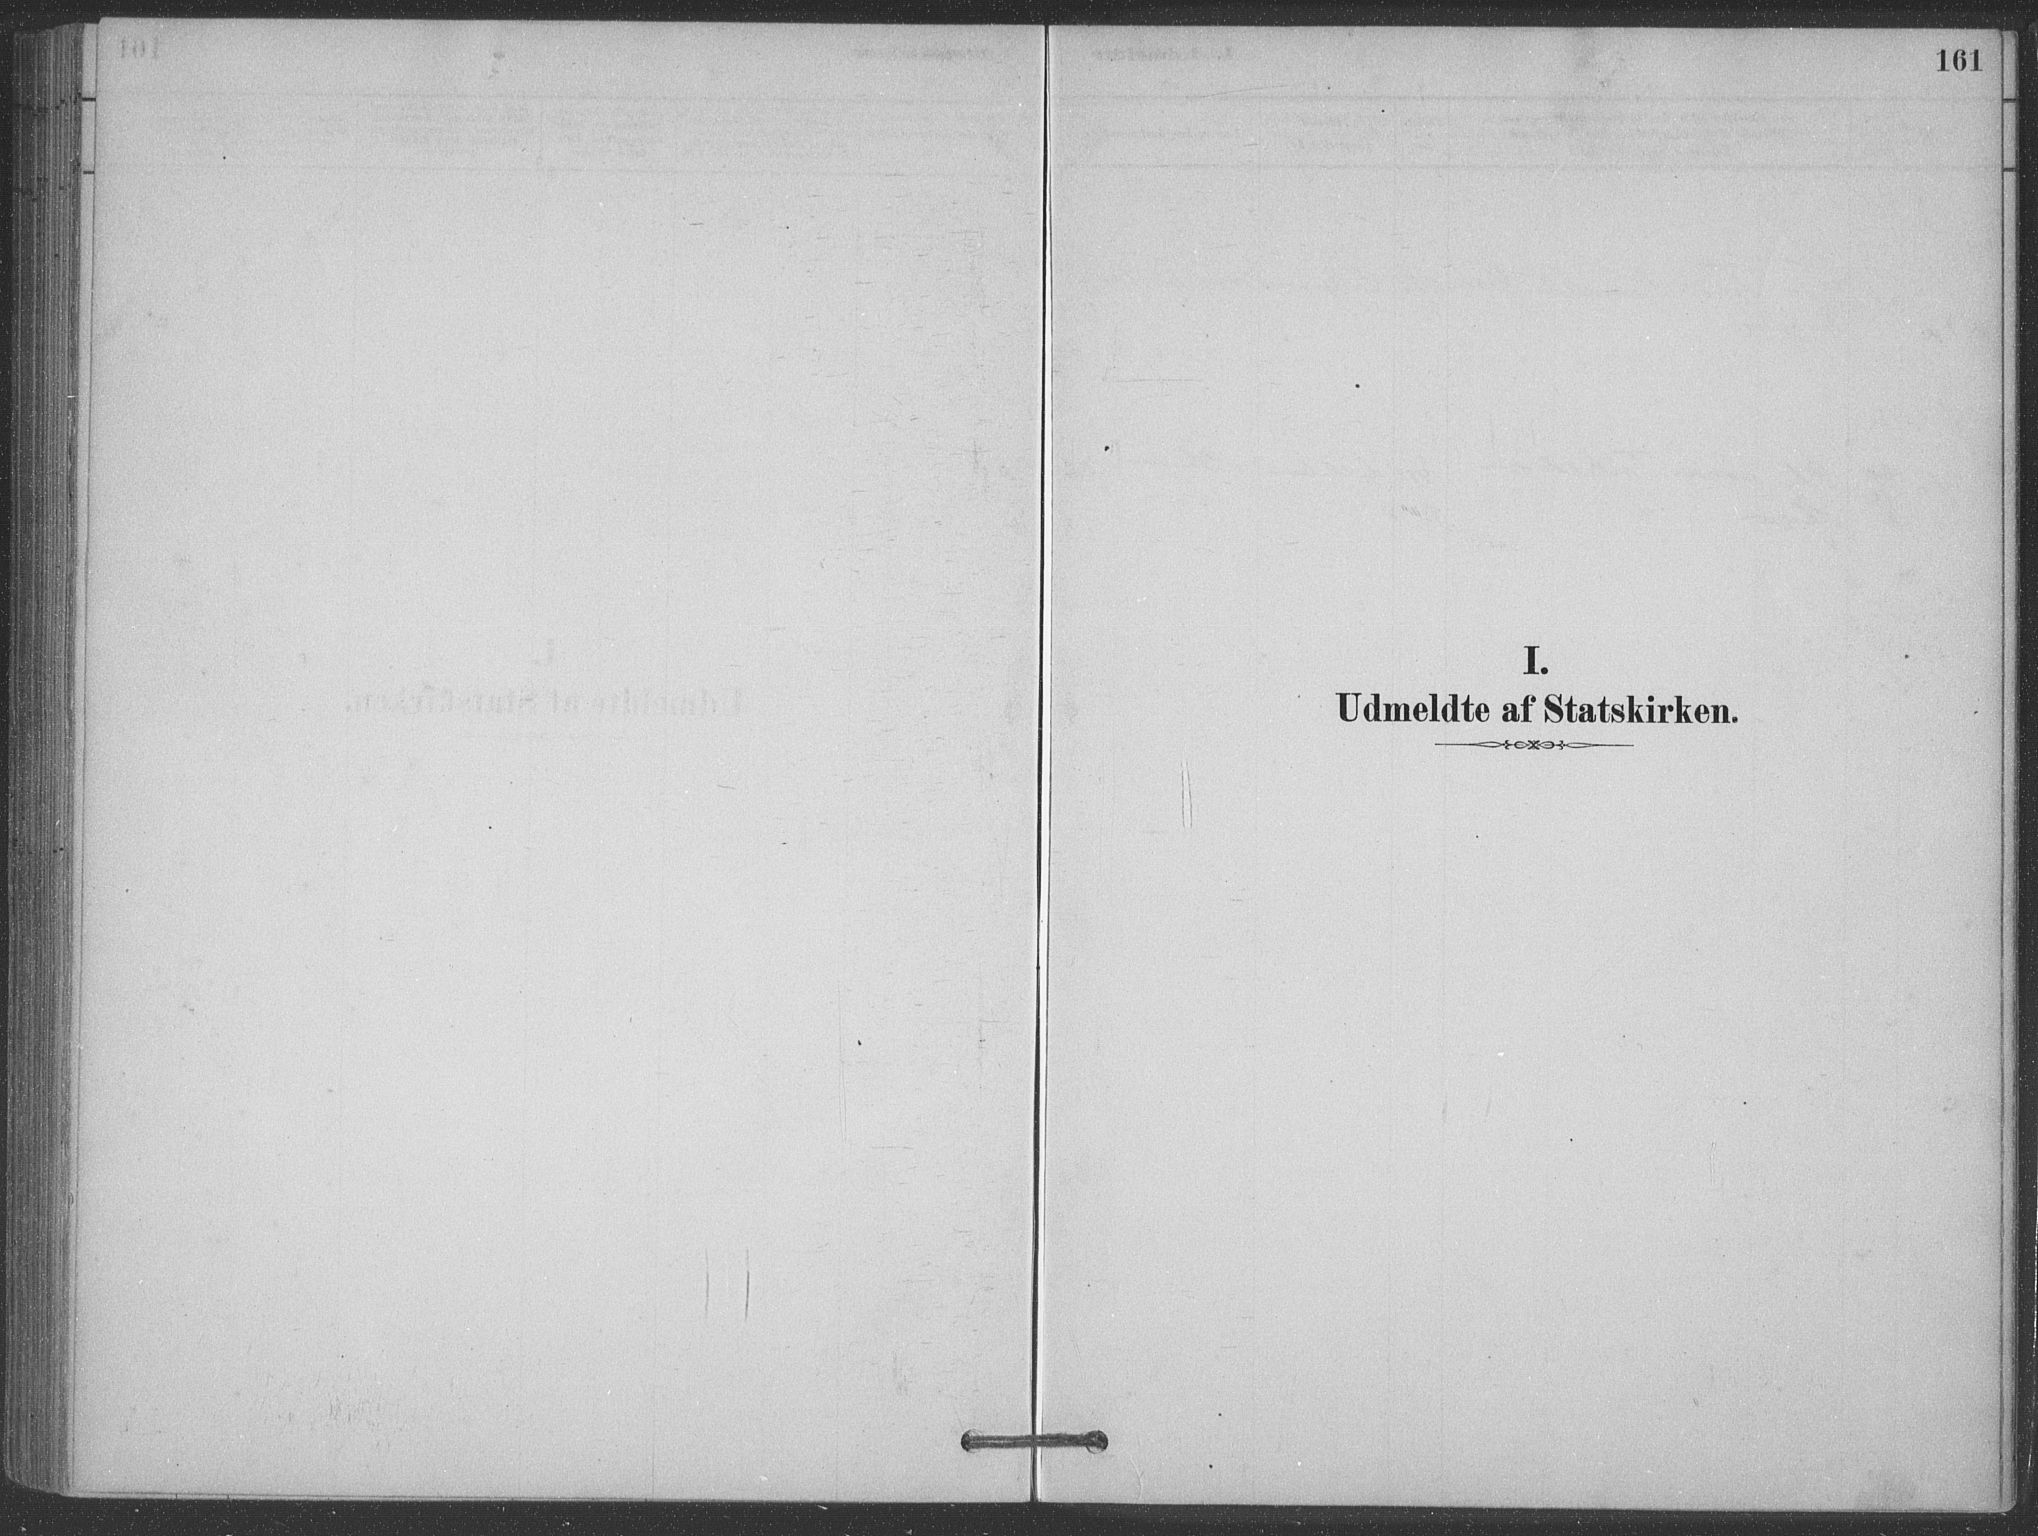 SAKO, Heddal kirkebøker, F/Fb/L0002: Ministerialbok nr. II 2, 1878-1913, s. 161